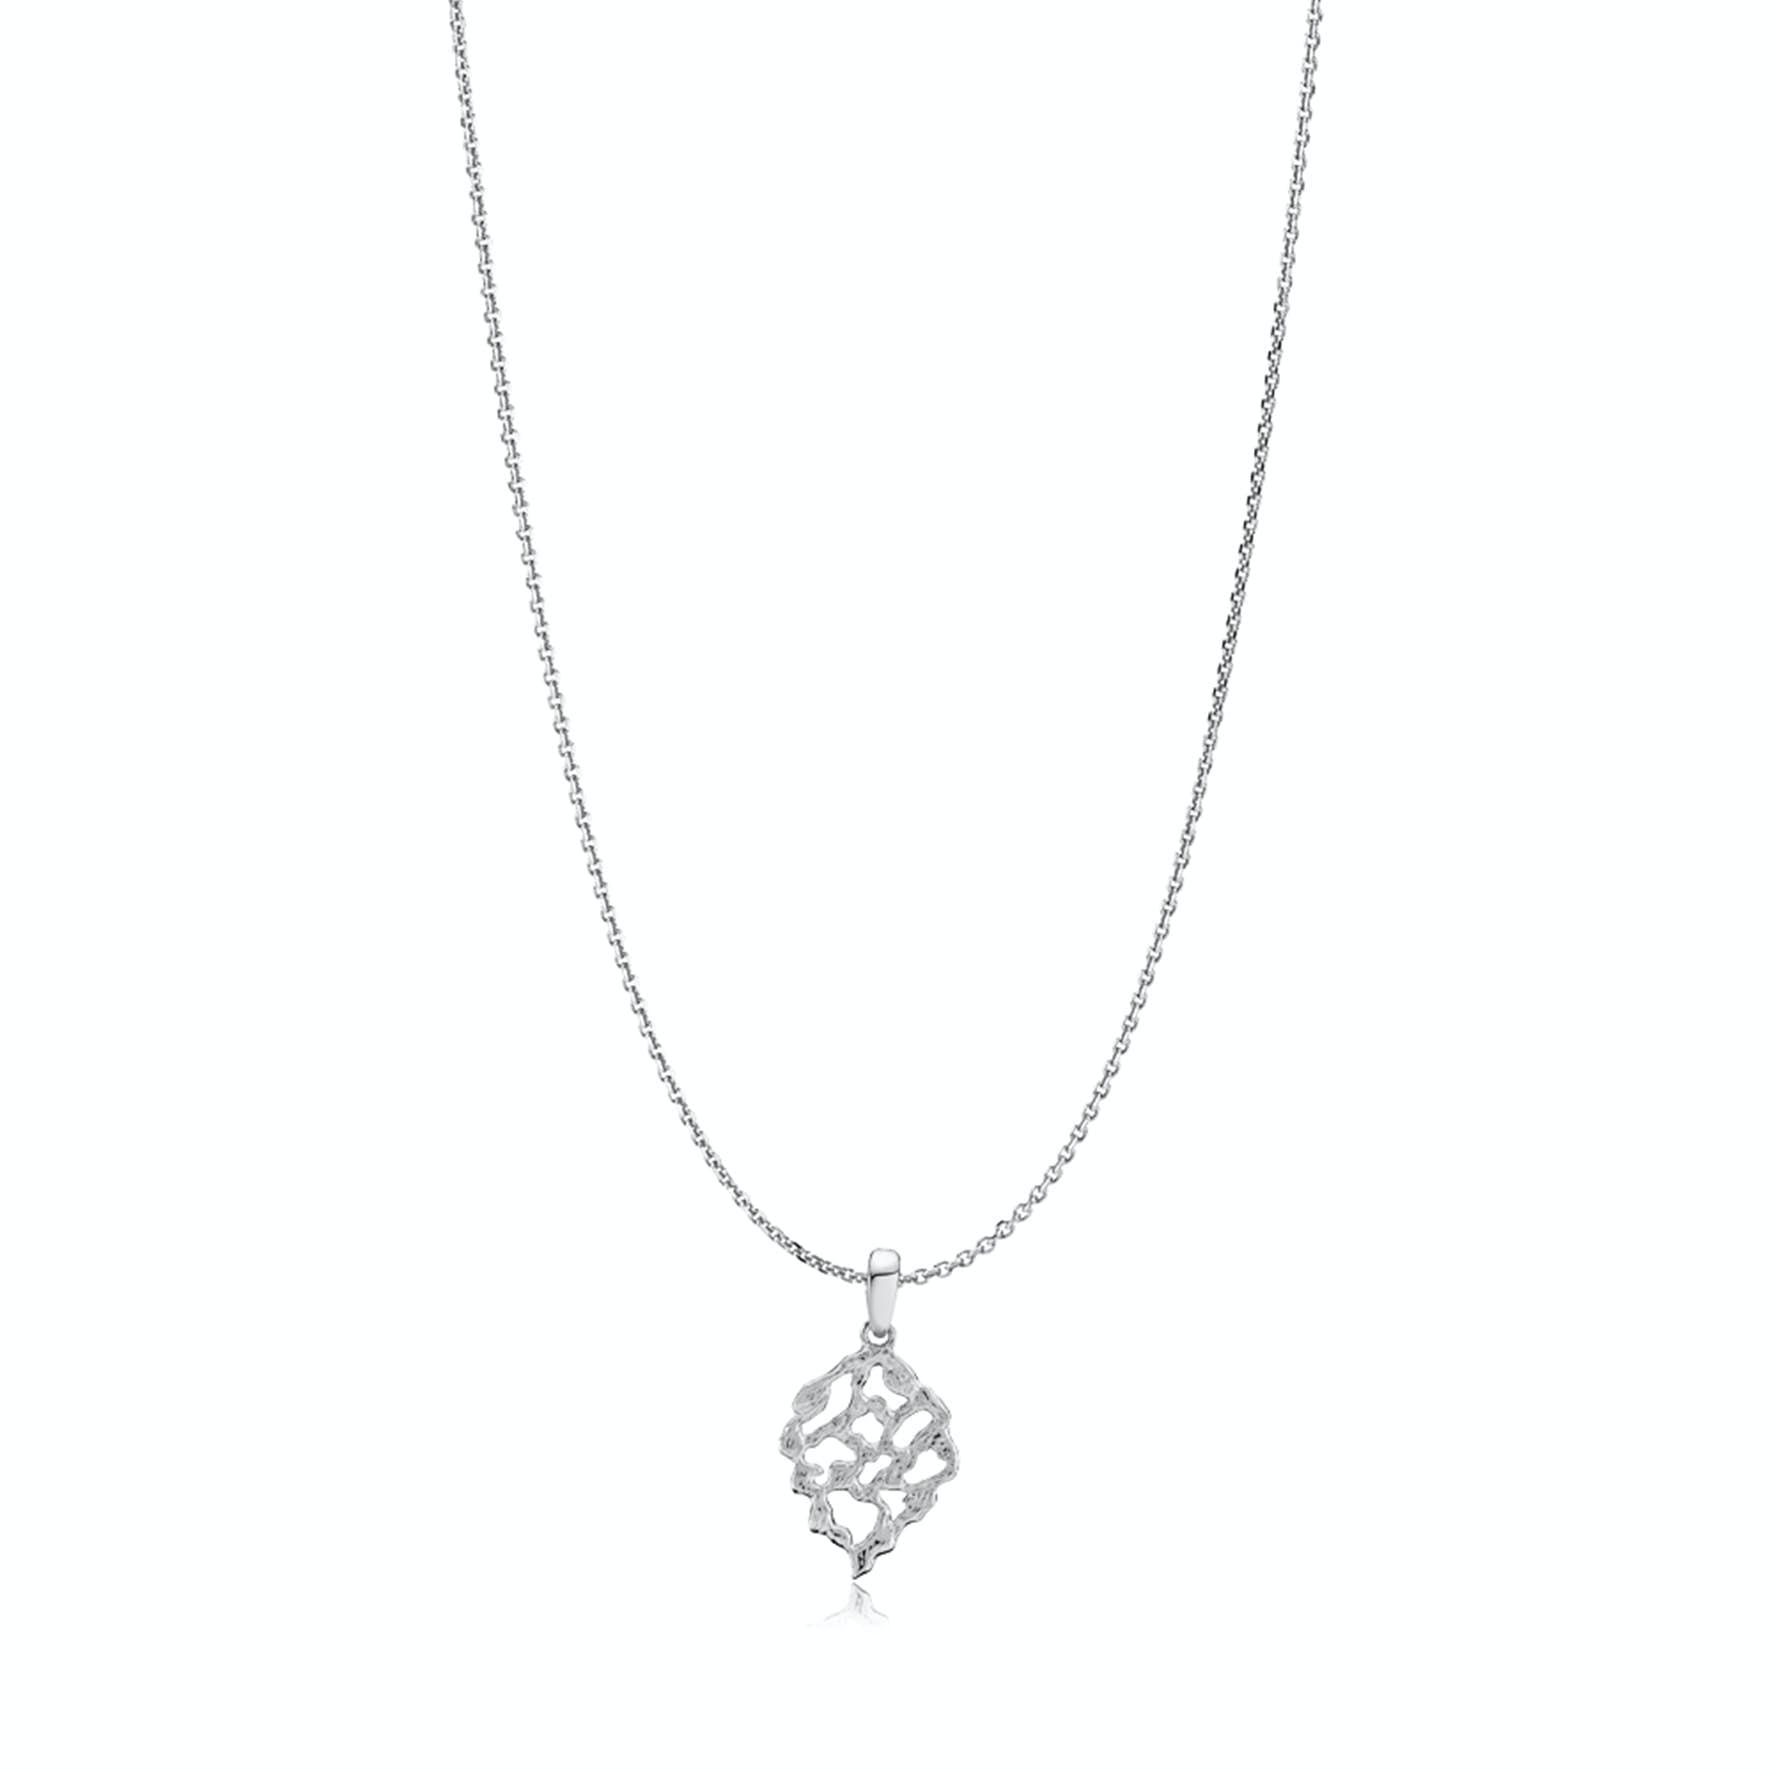 Holly Necklace från Izabel Camille i Silver Sterling 925